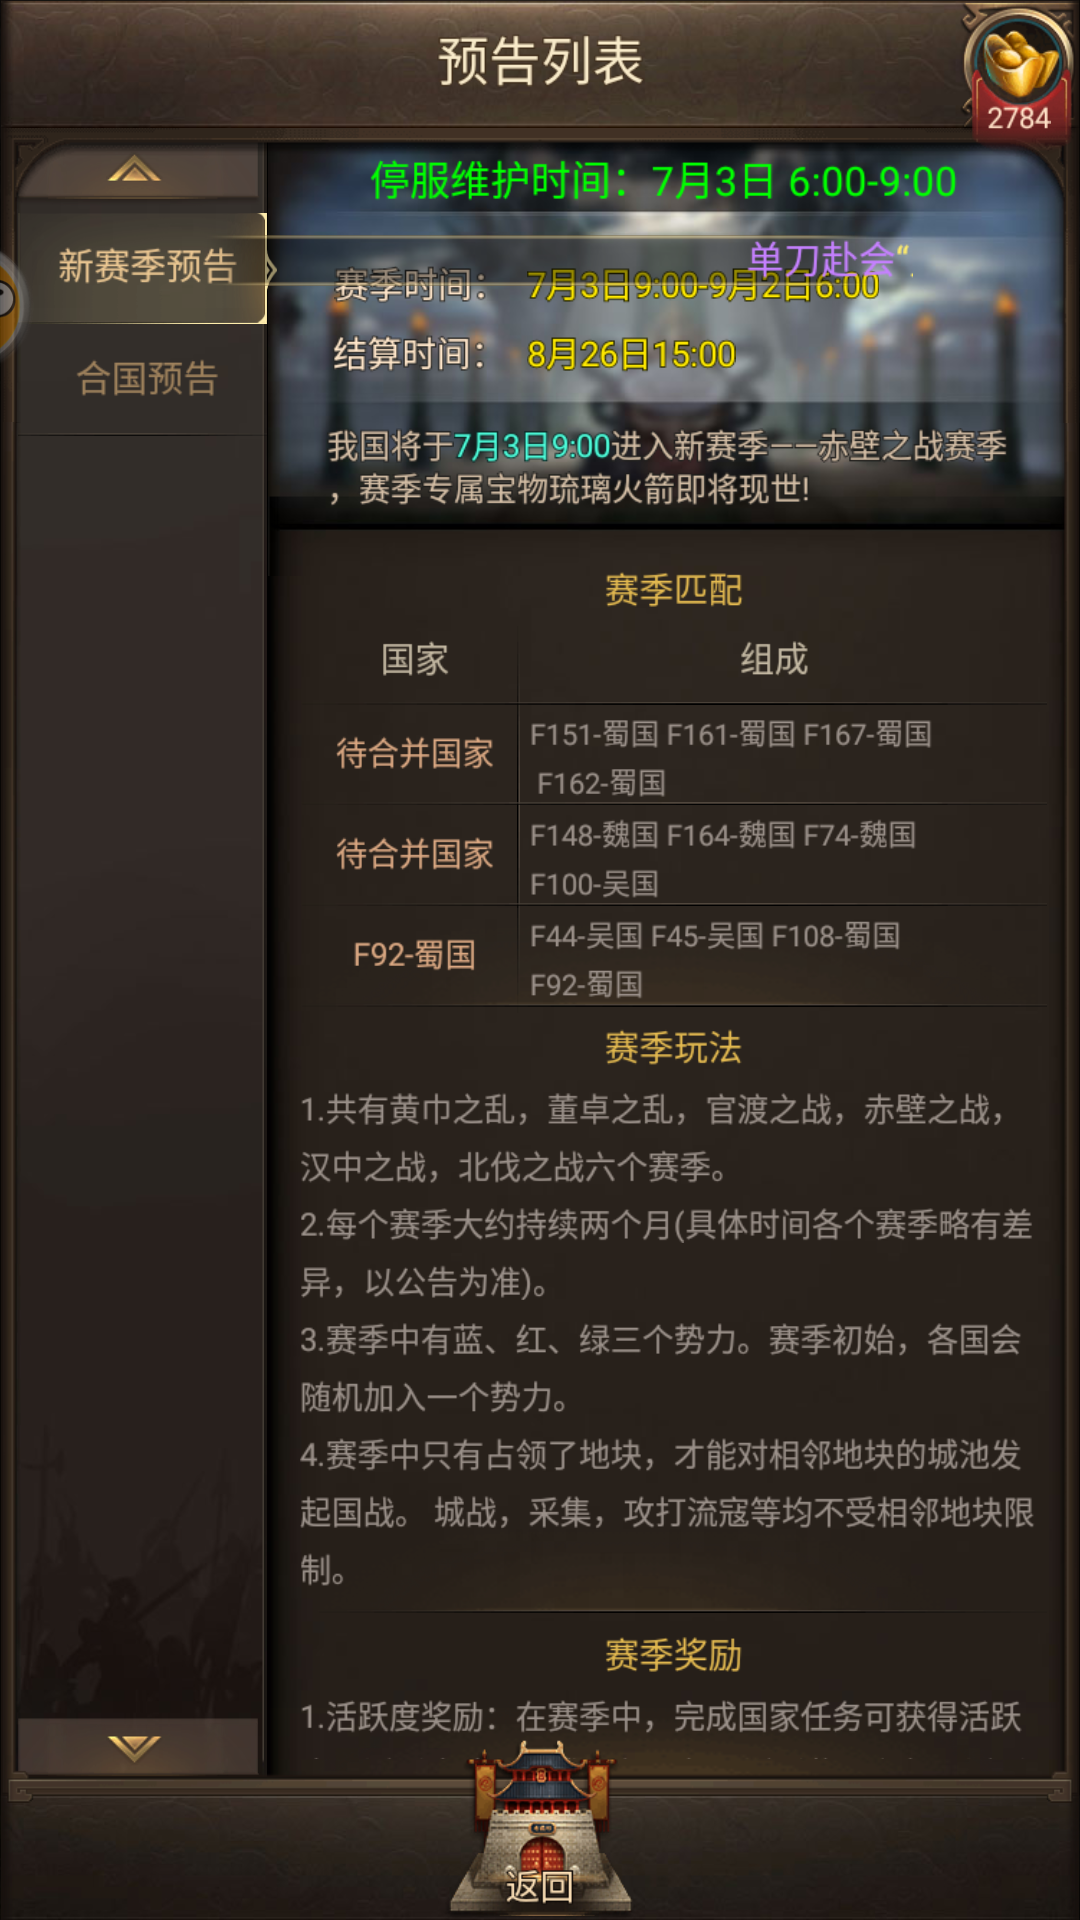 Screenshot_2019-06-28-21-48-19-463_com.juedigame.sgdjl.shoumeng.png